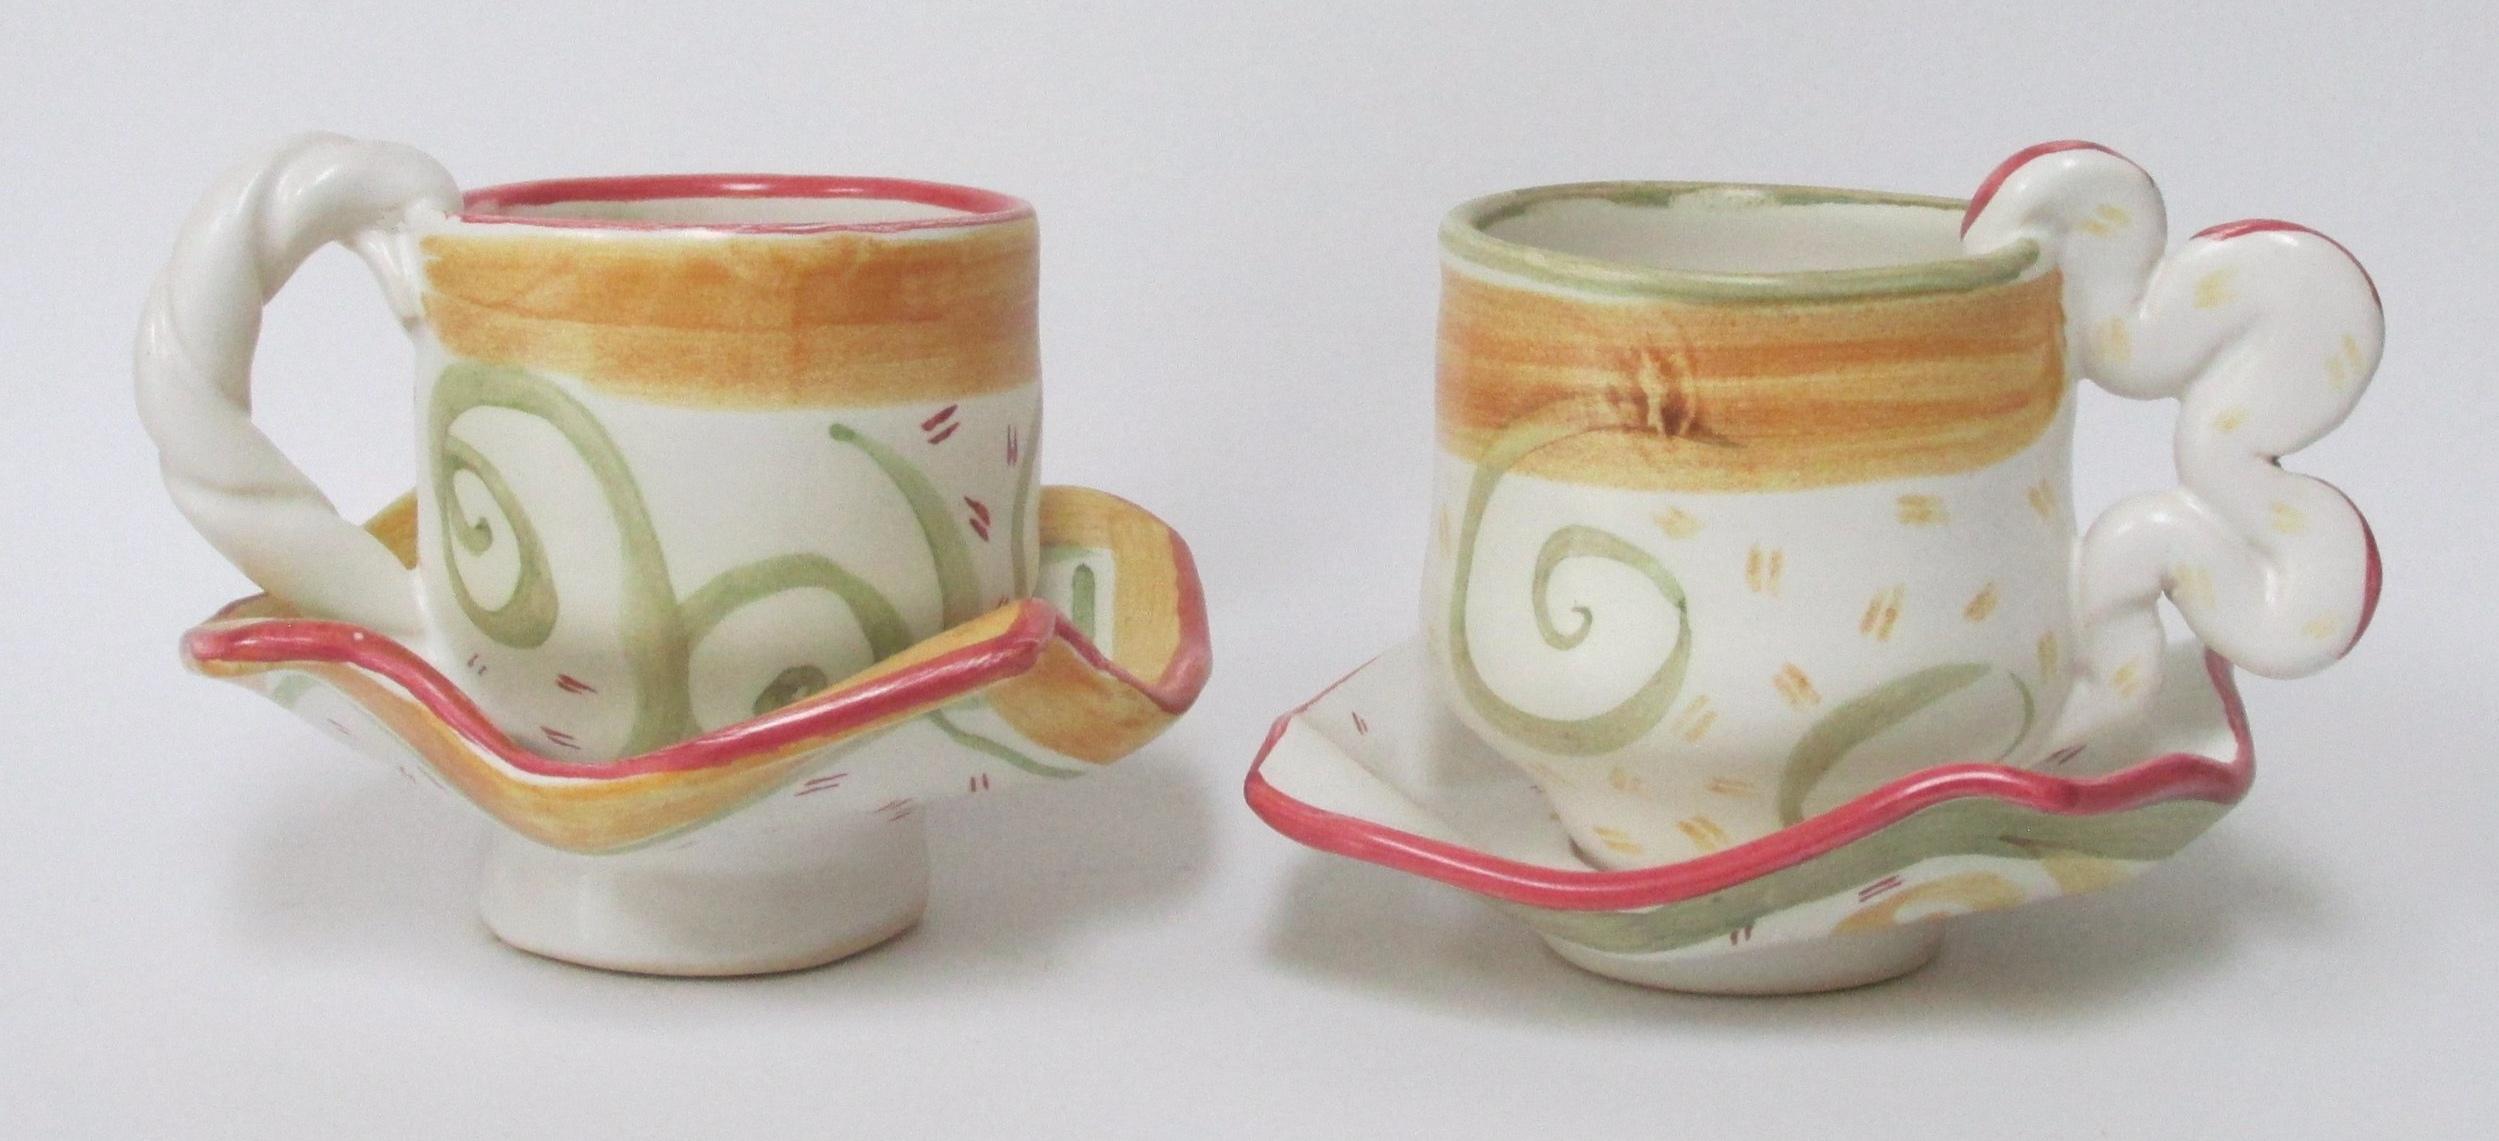 cone+6+white+stoneware%2C+stains.+4+inches%2C+Karen+Robinson.jpg